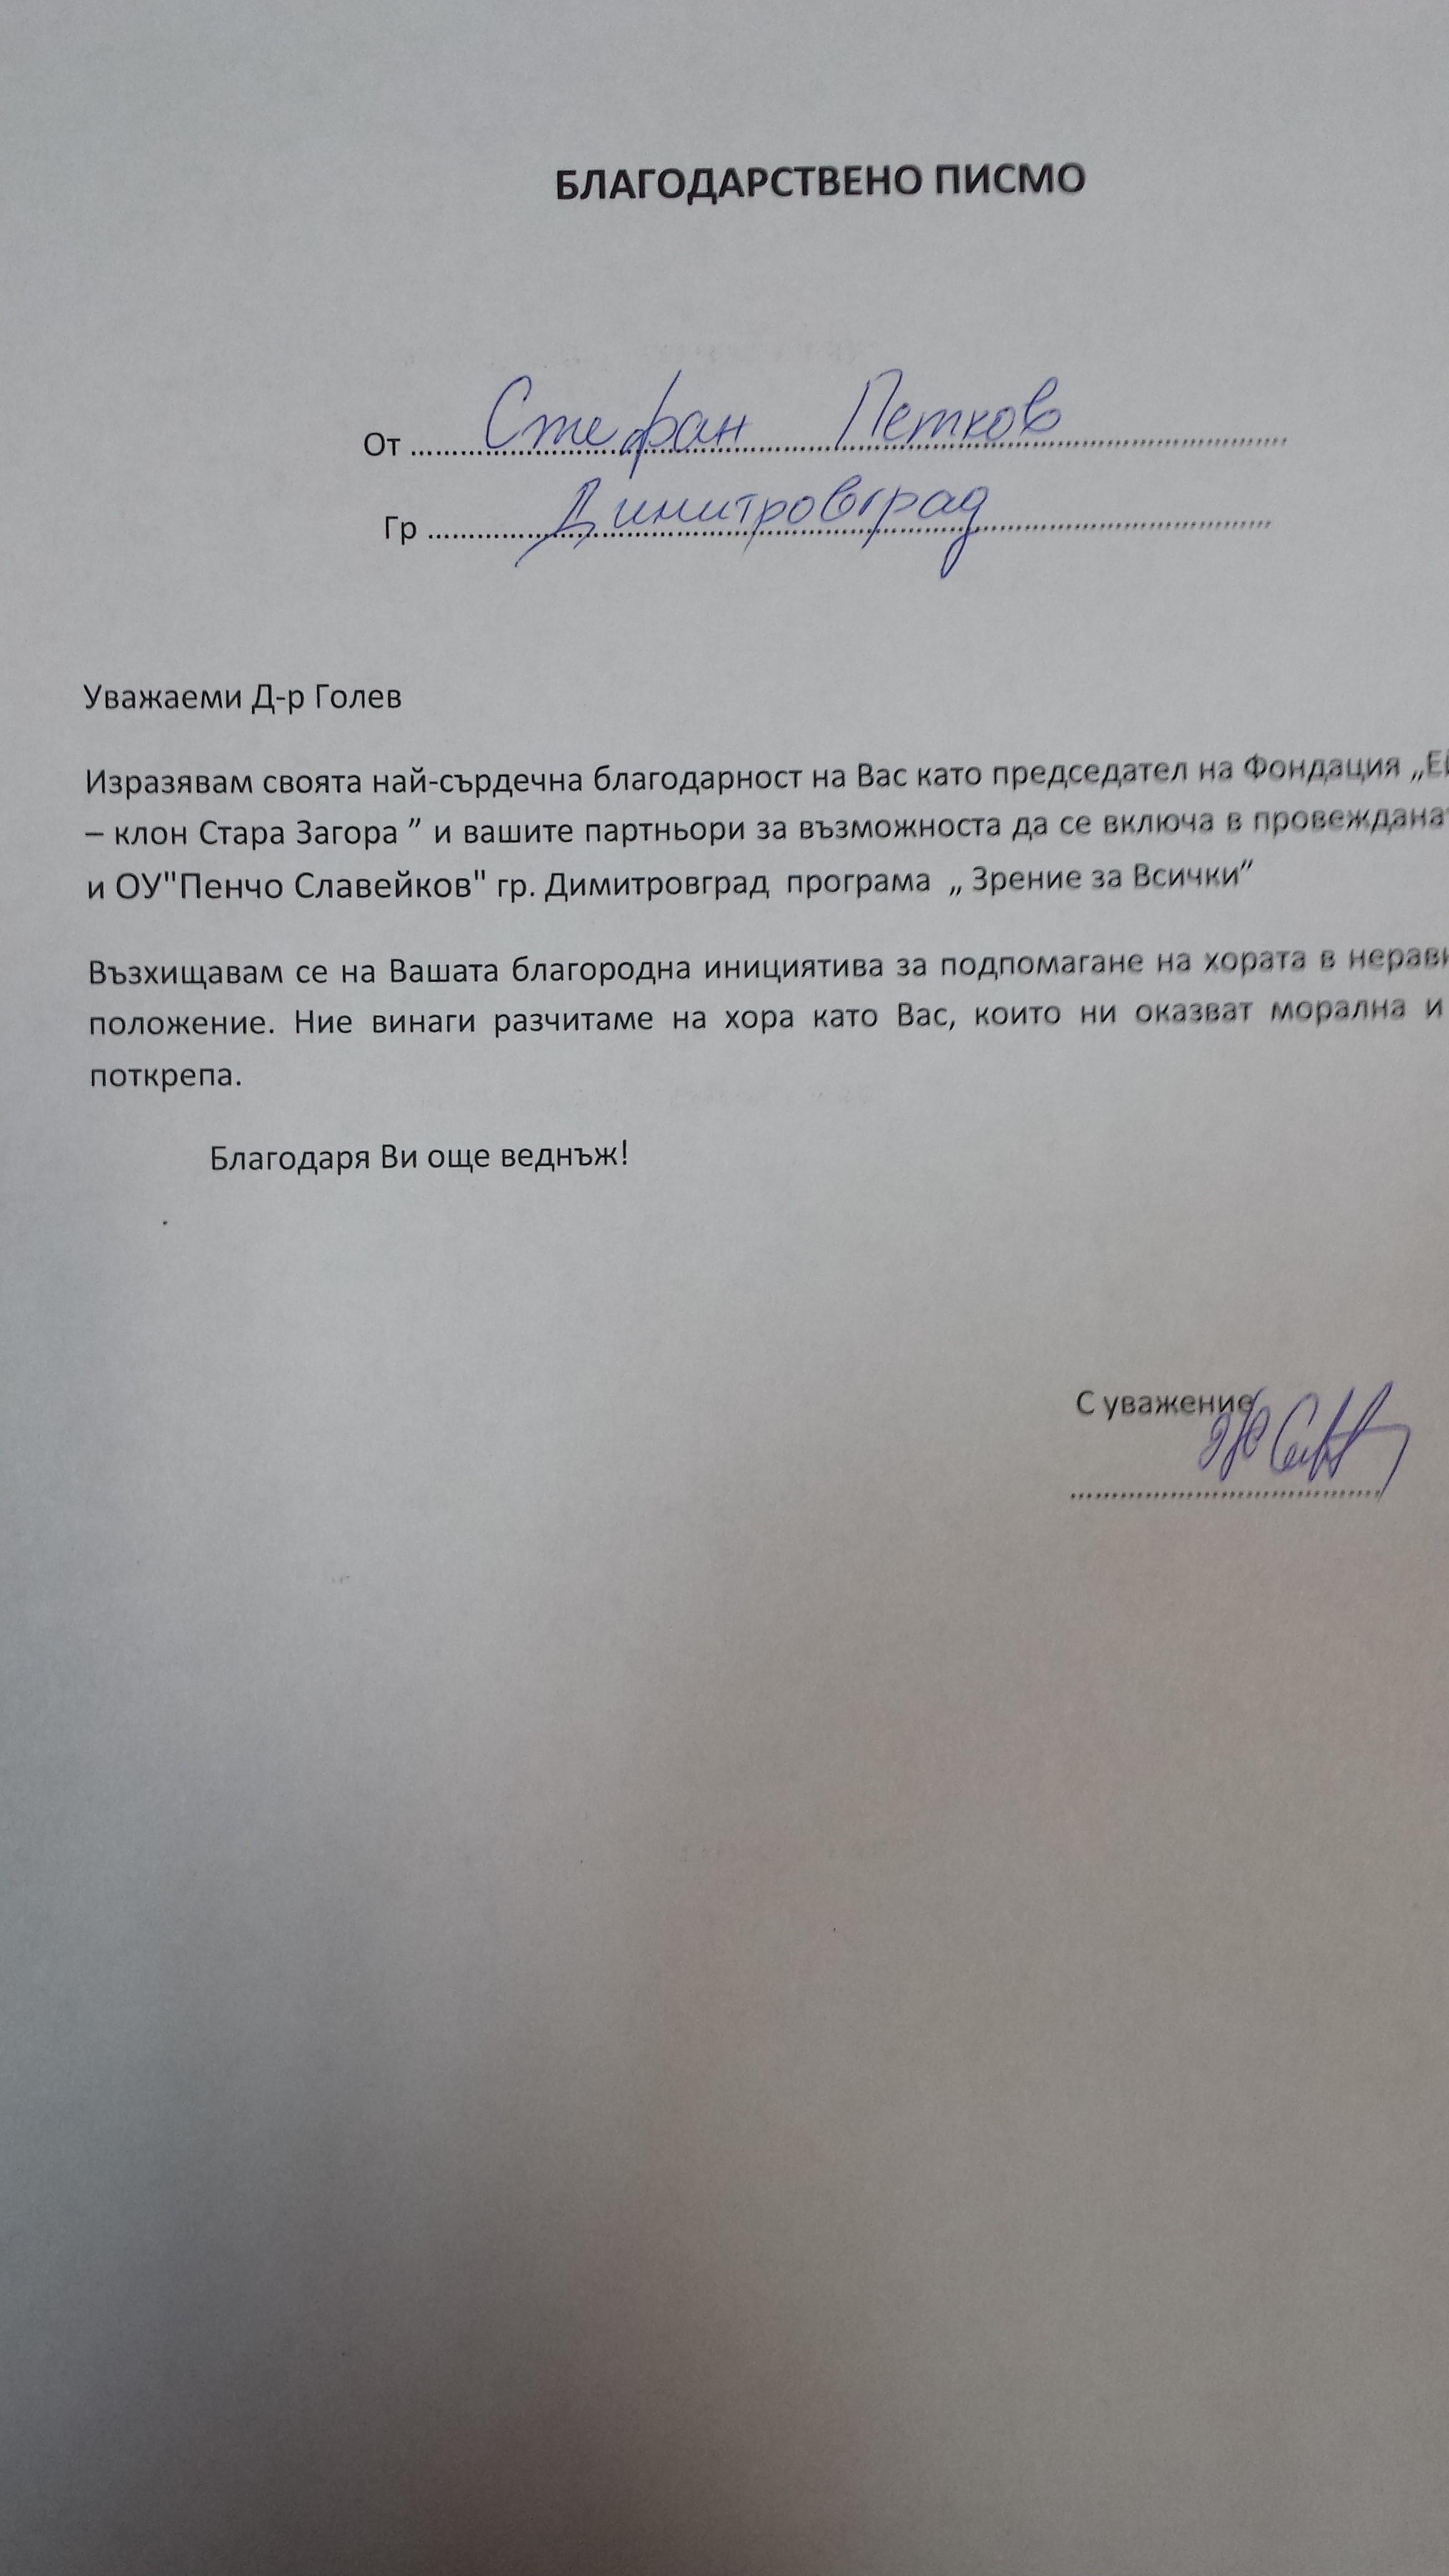 Благодарствено Писмо Стефан Петков